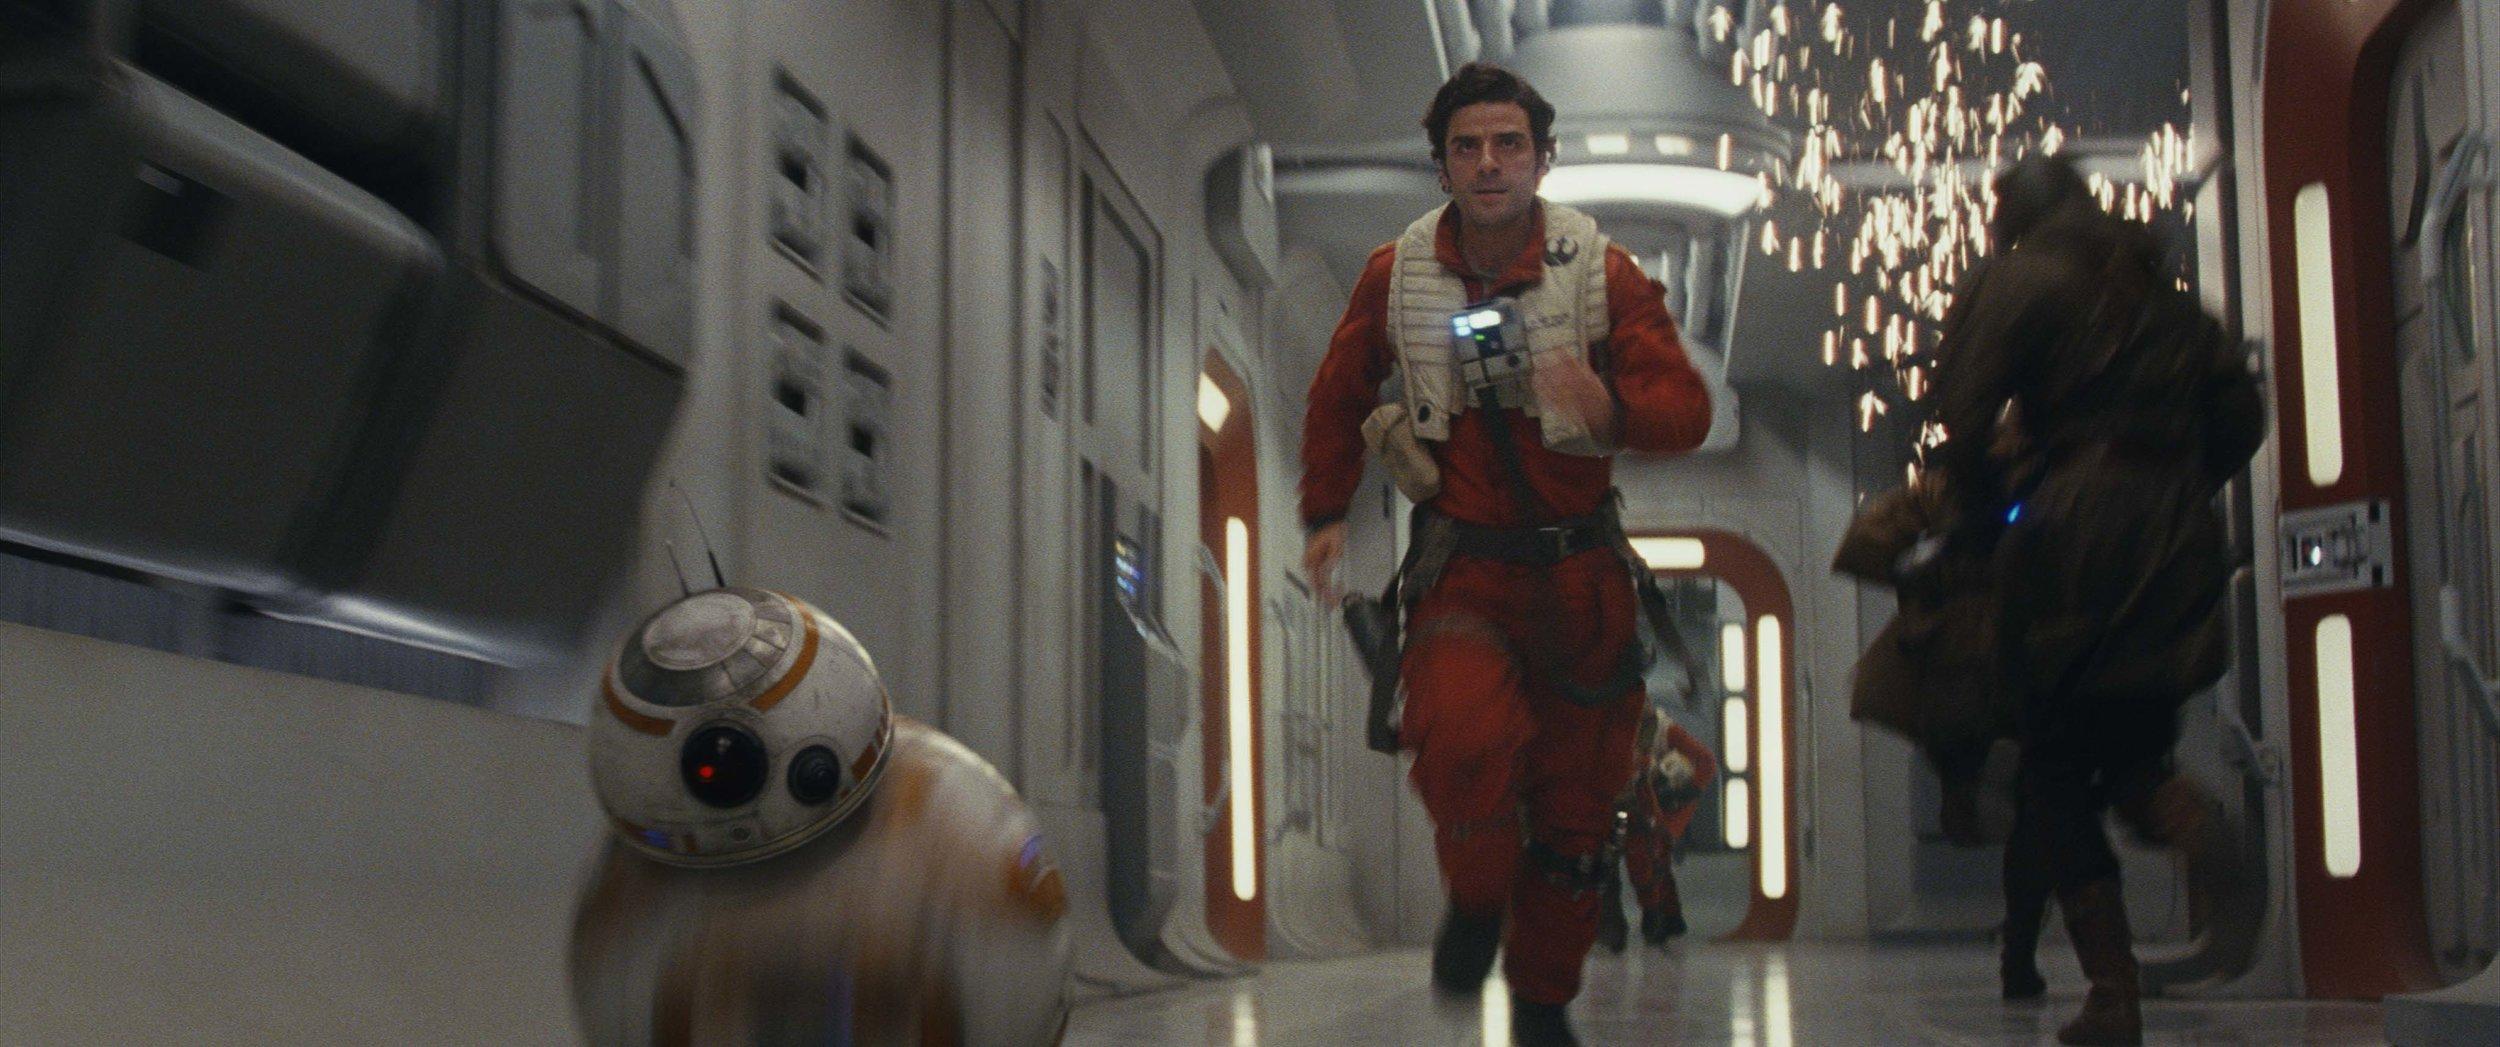 The_Last_Jedi_Hero_Shot.jpg